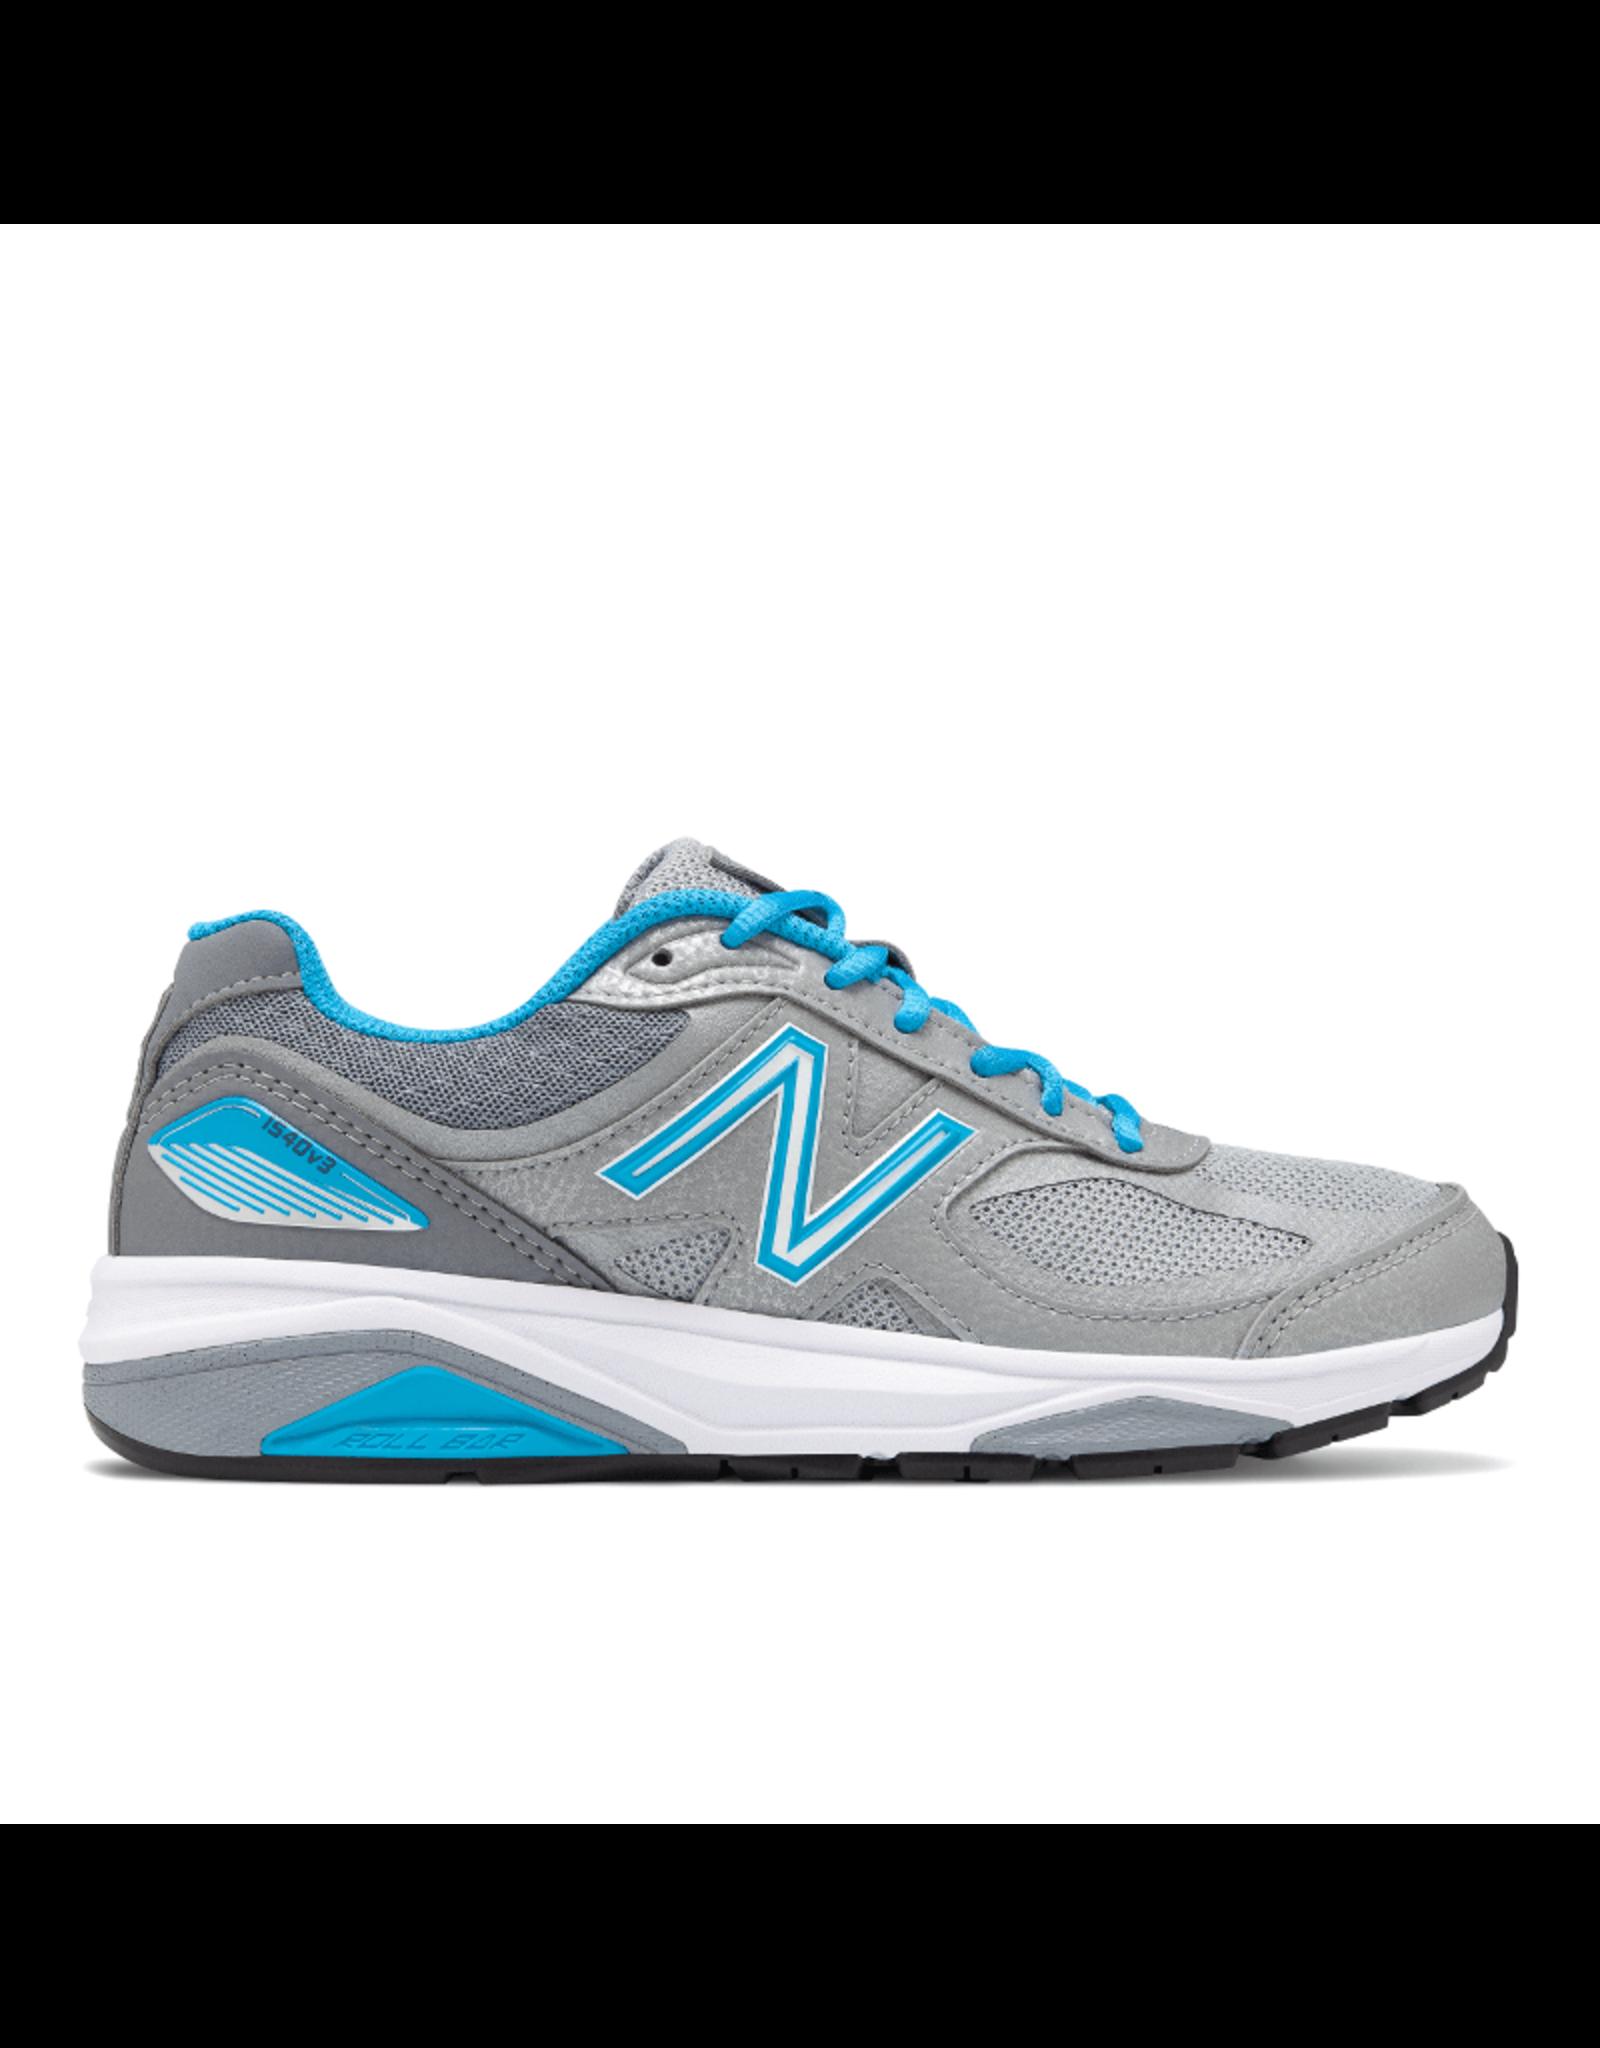 New Balance New Balance - W's - 1540v3 -